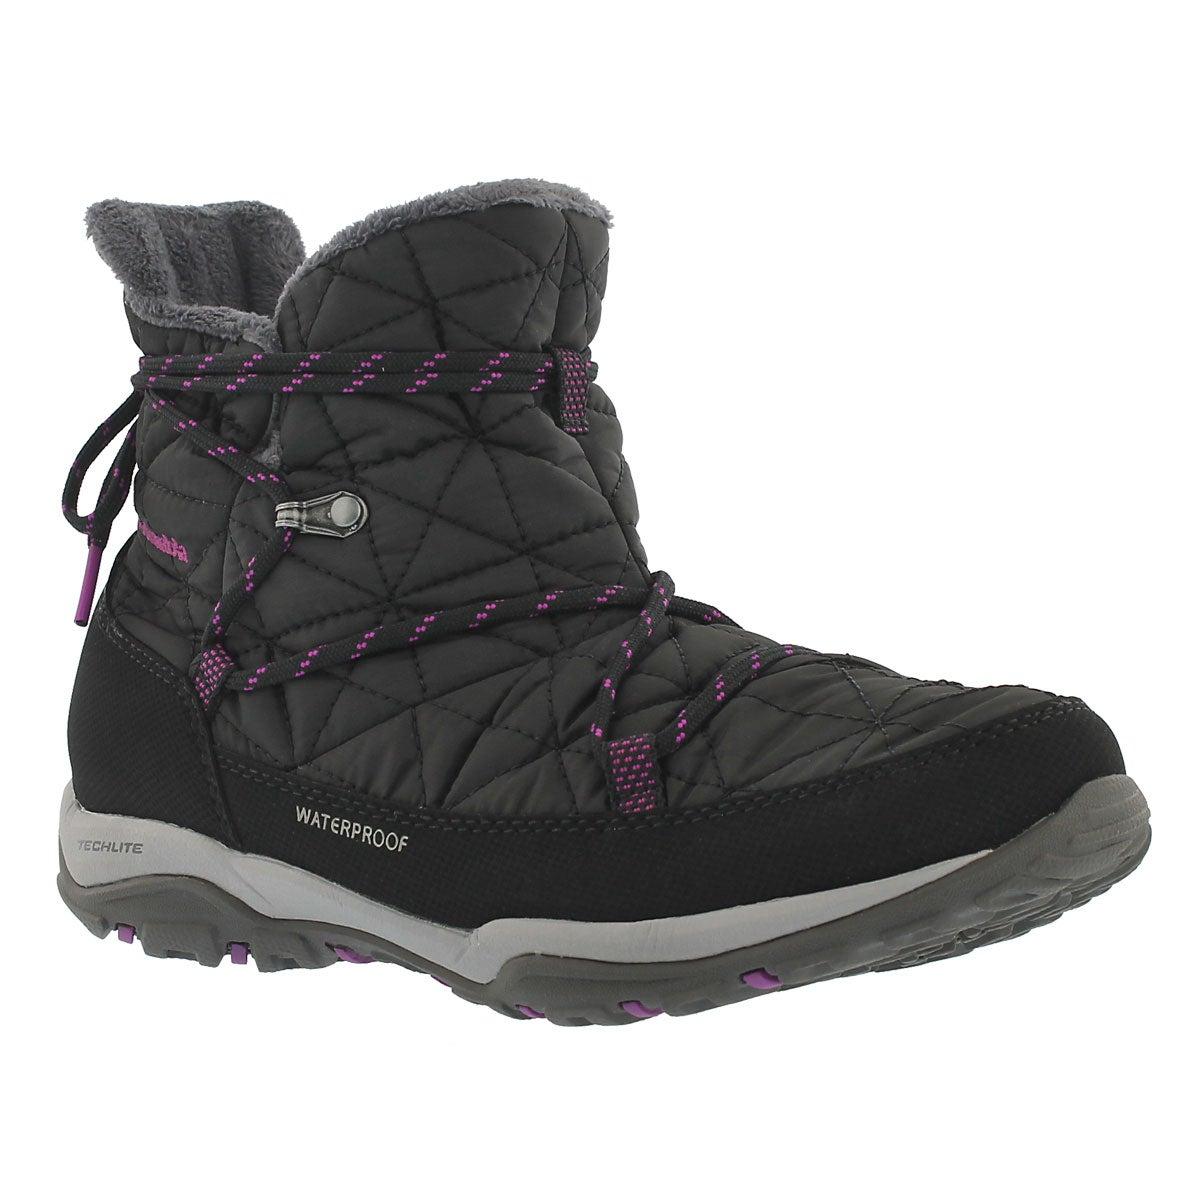 Women's LOVELAND SHORTY OmniHeat black boots